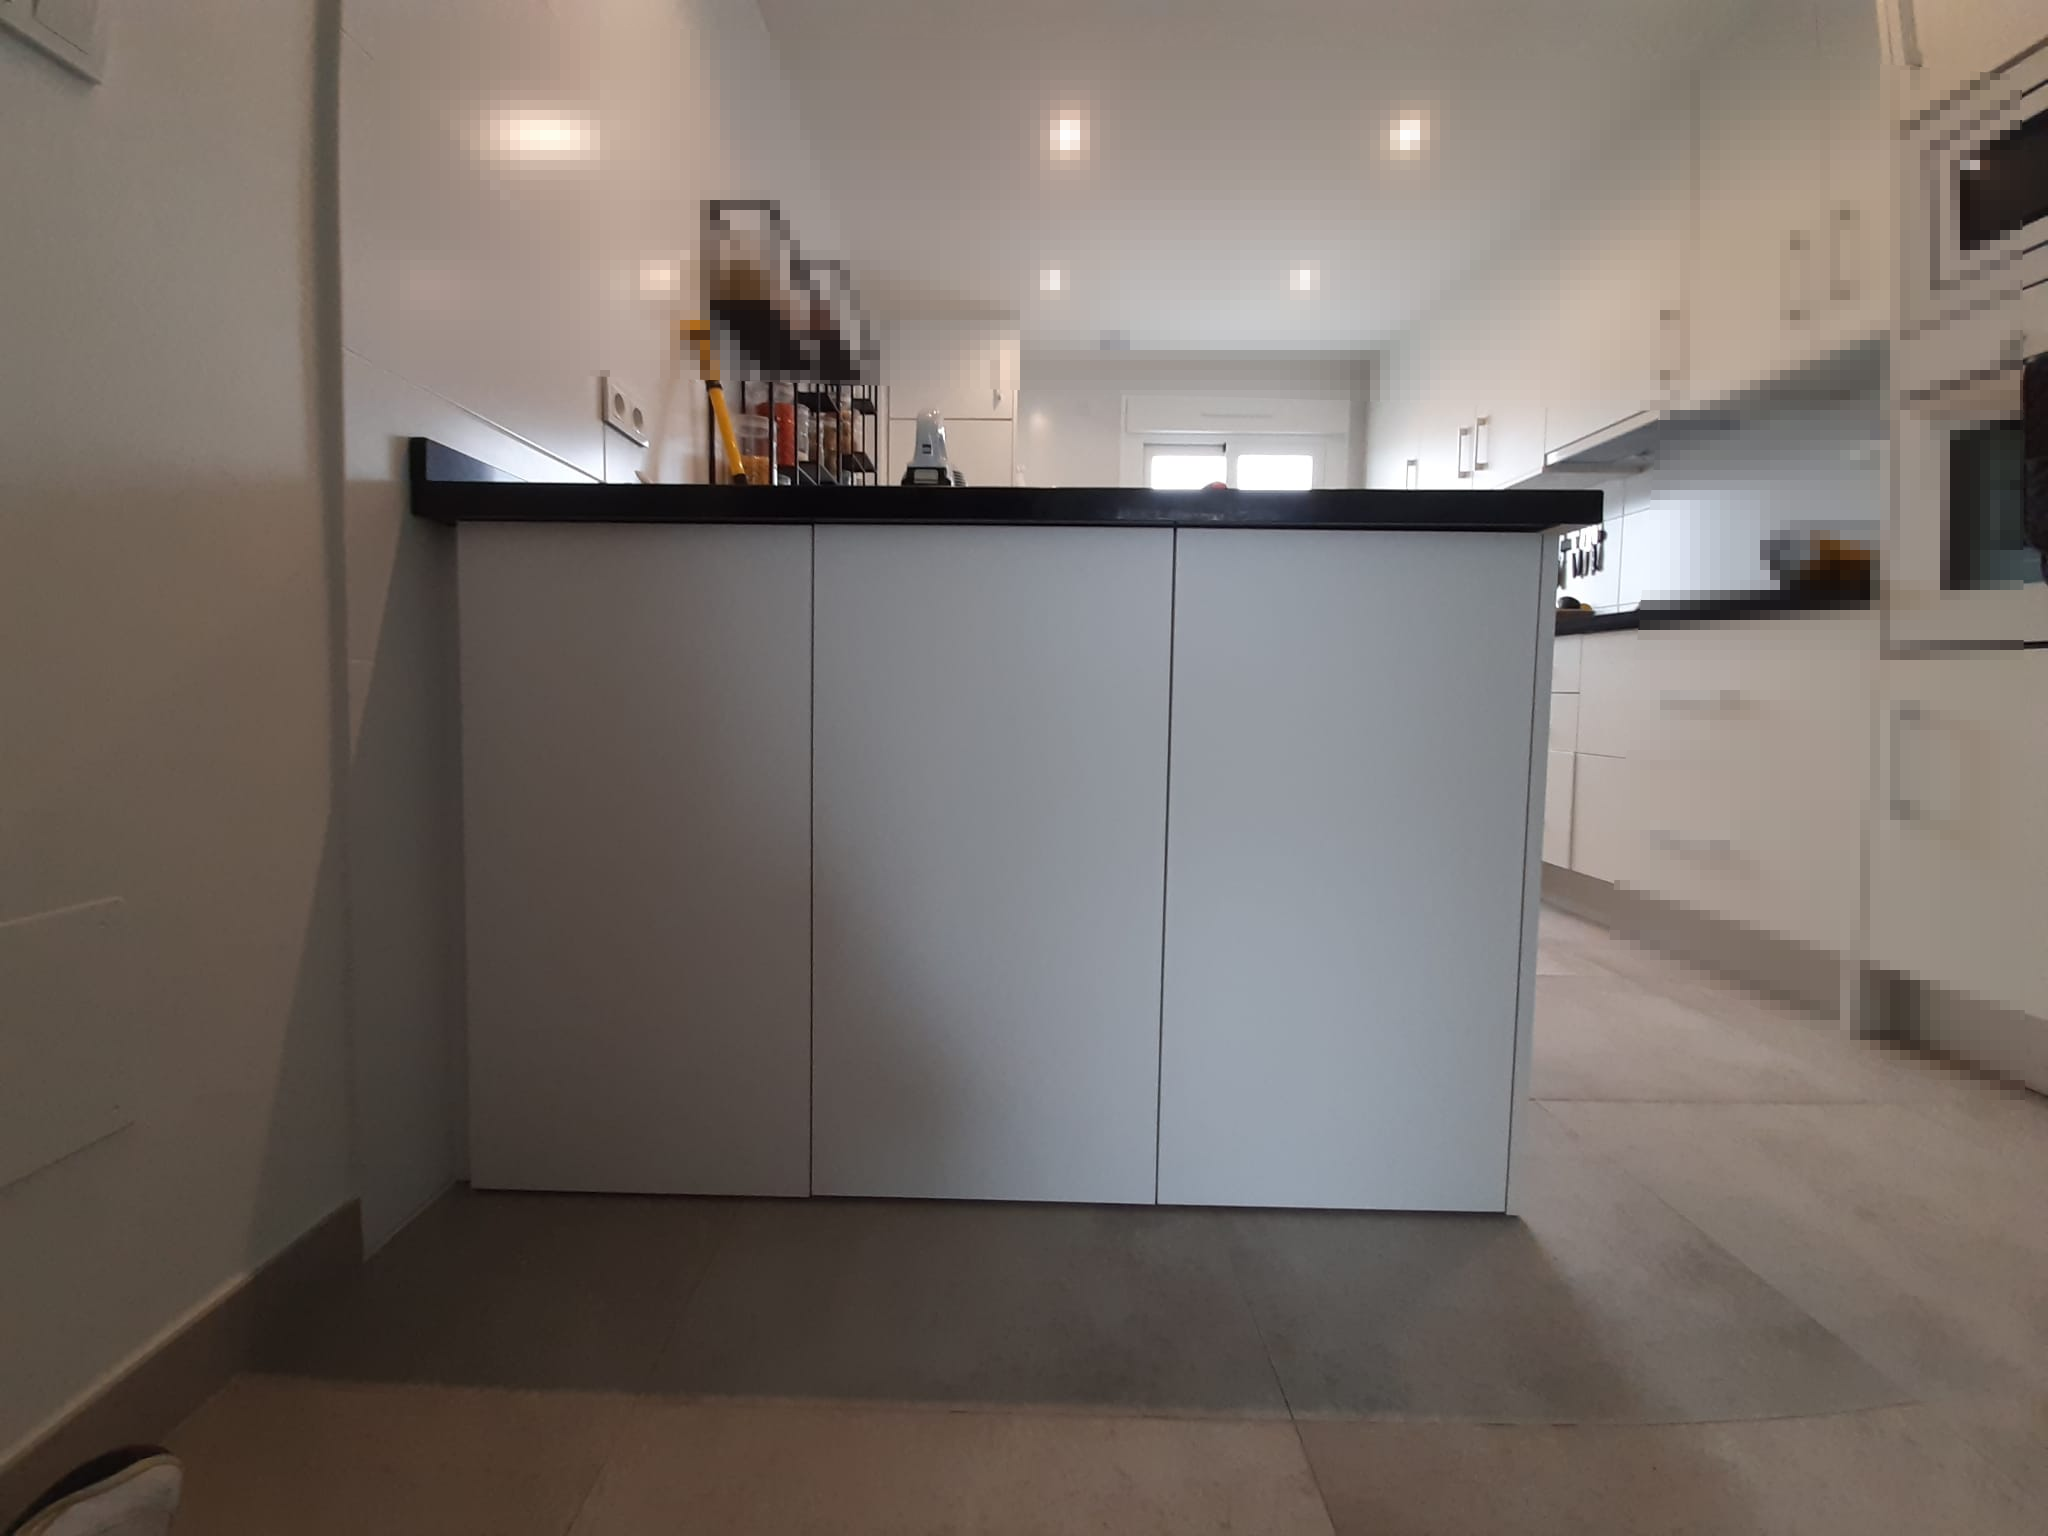 carpinteria-de-madera-mueble-cocina-furniture-kitchen-torrevieja